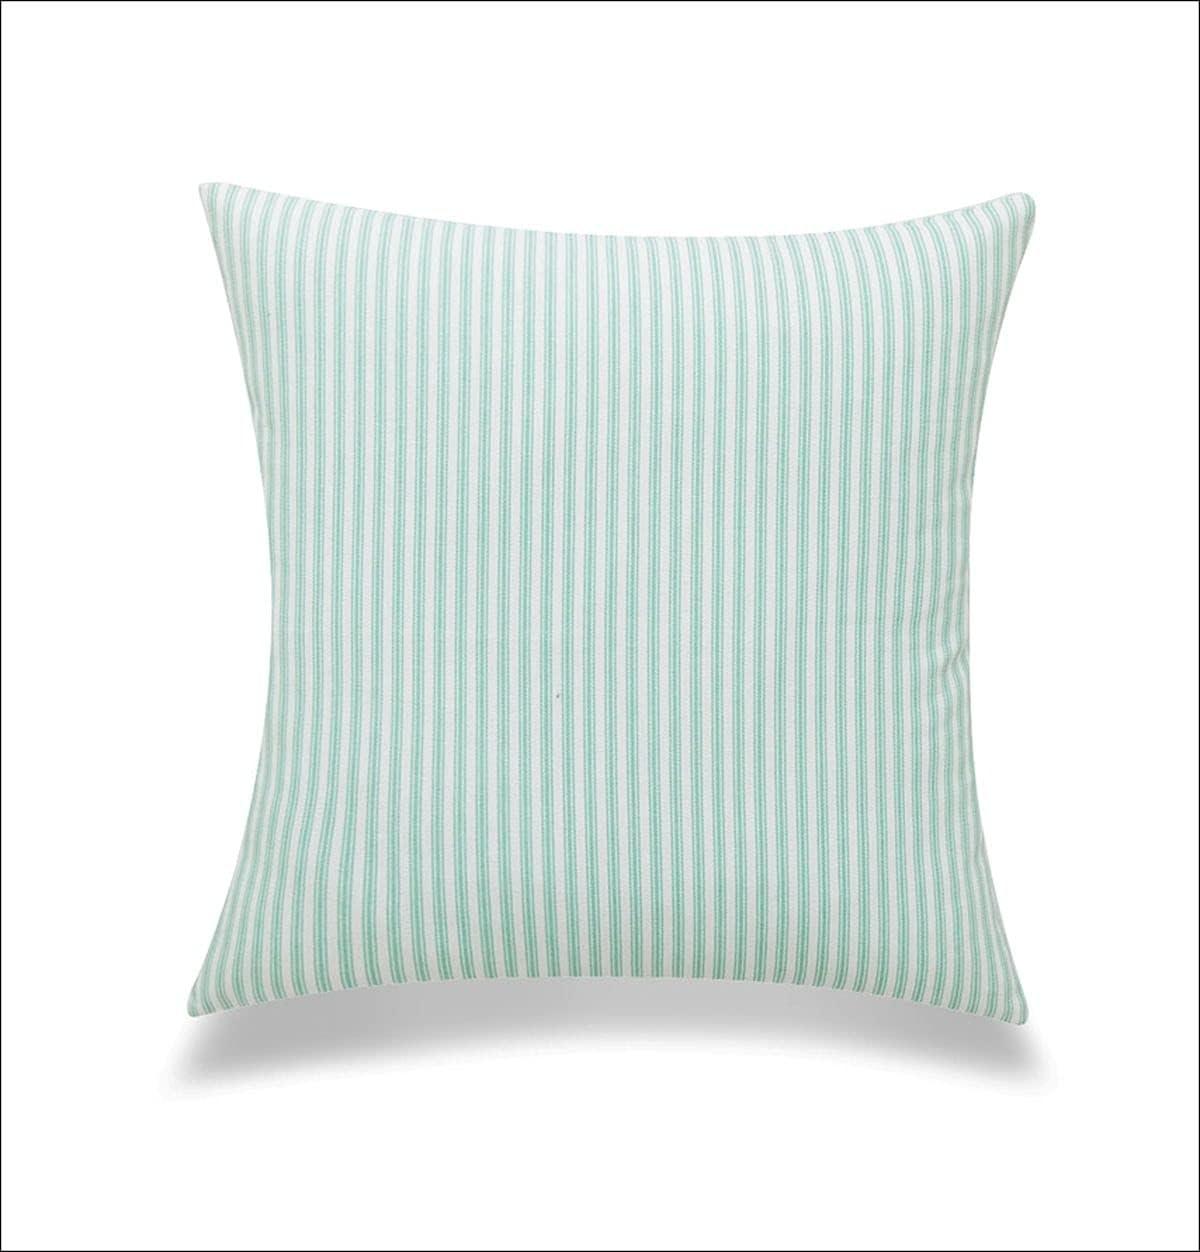 Boston Mall Green New sales and White Stripes Cushion